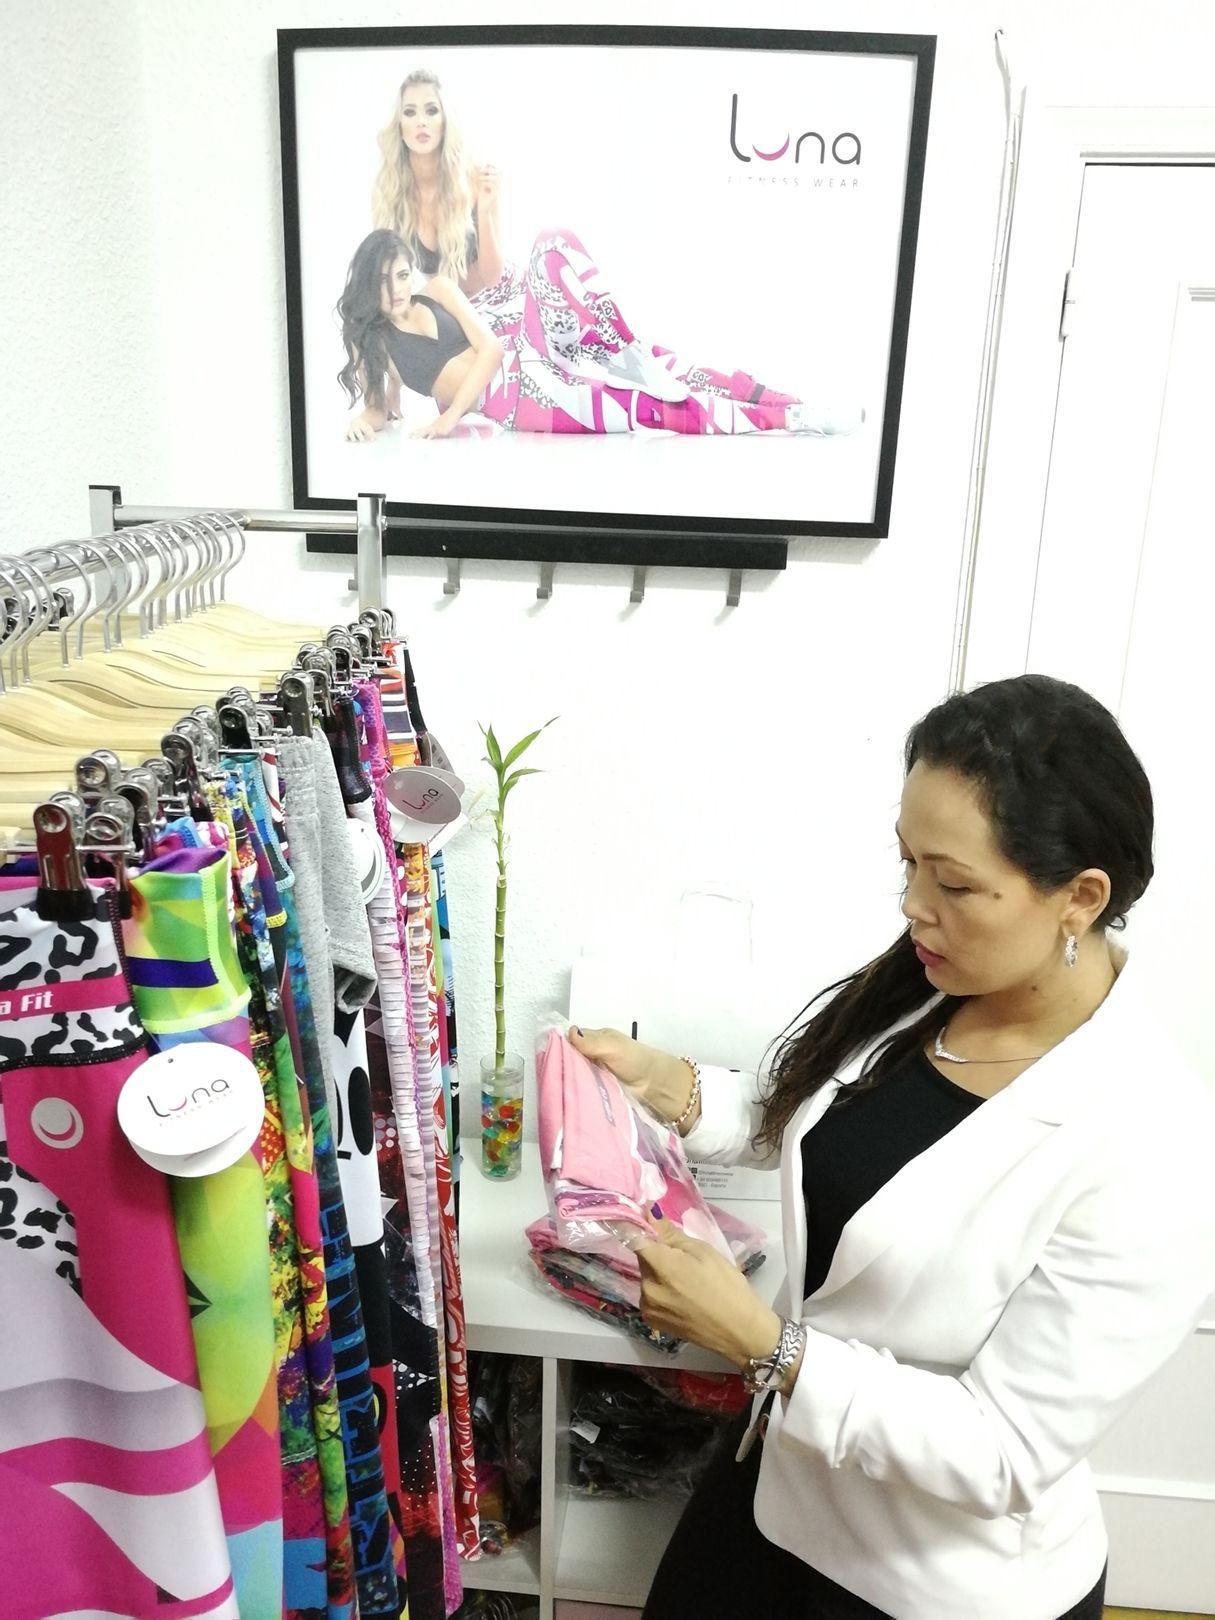 Fotografia Lina Martínez en su showroom